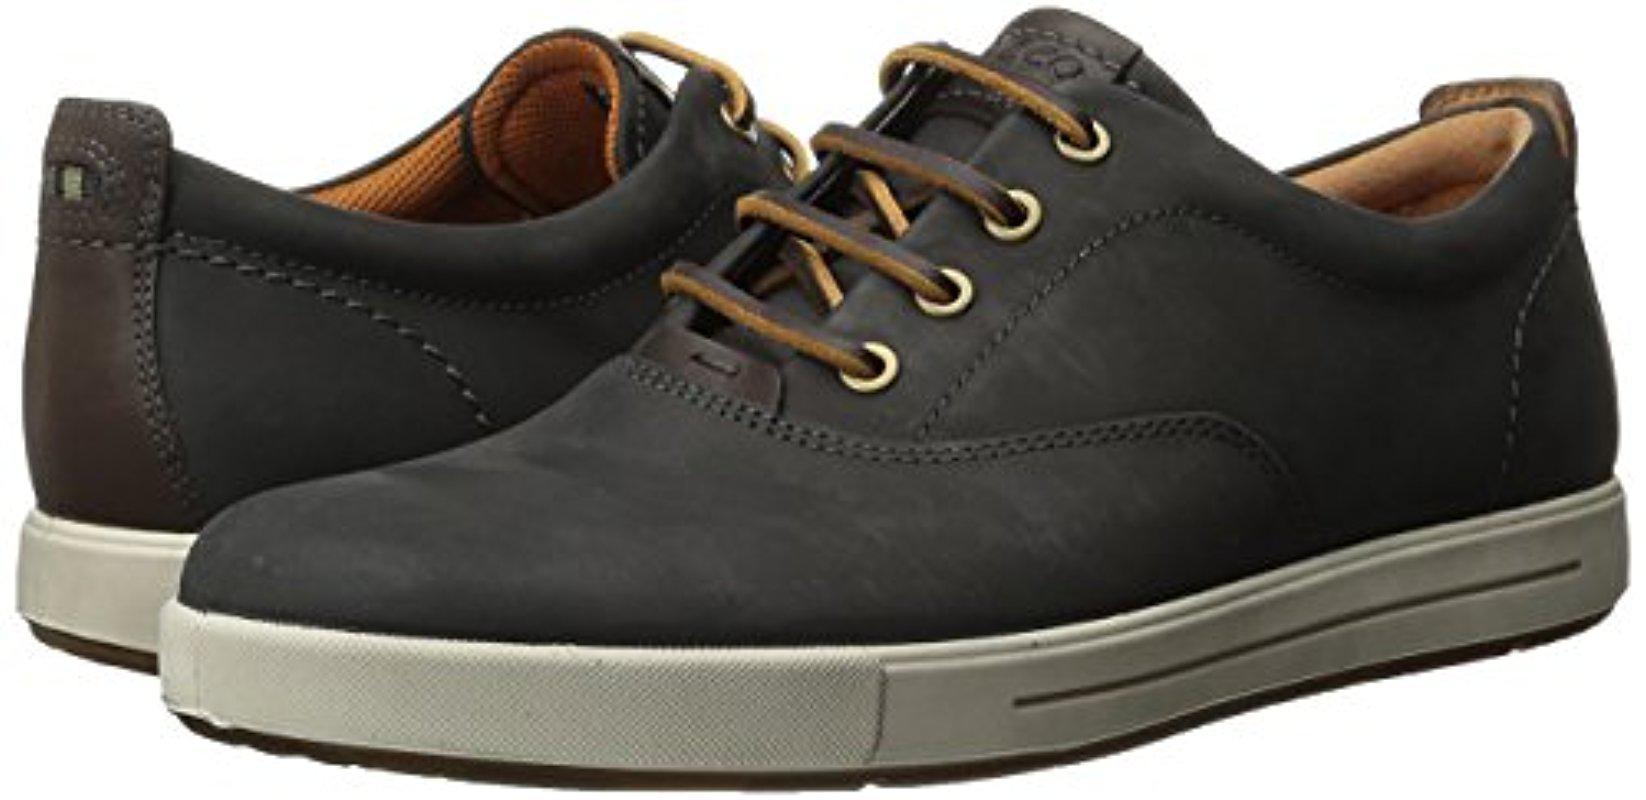 Ecco Leather Eisner Tie Walking Shoe in